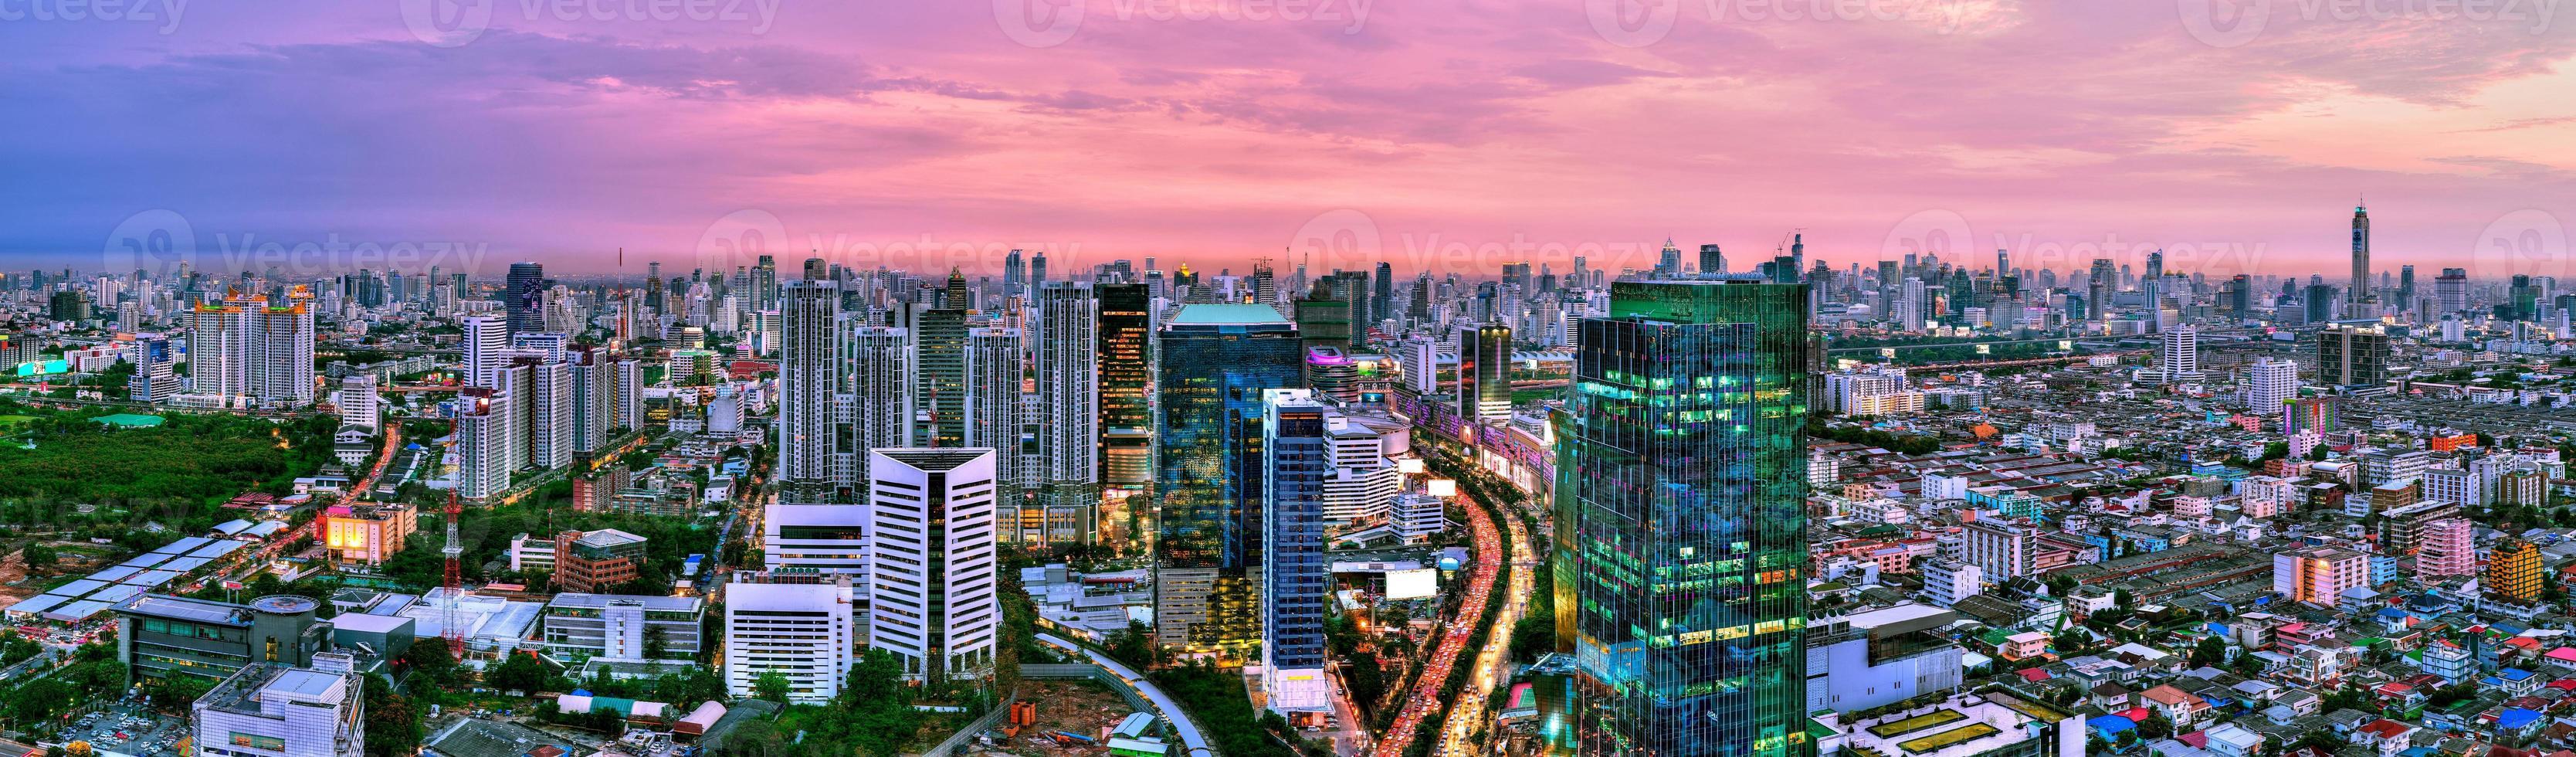 Panorama view of Bangkok city scape at sunset, Thailand photo